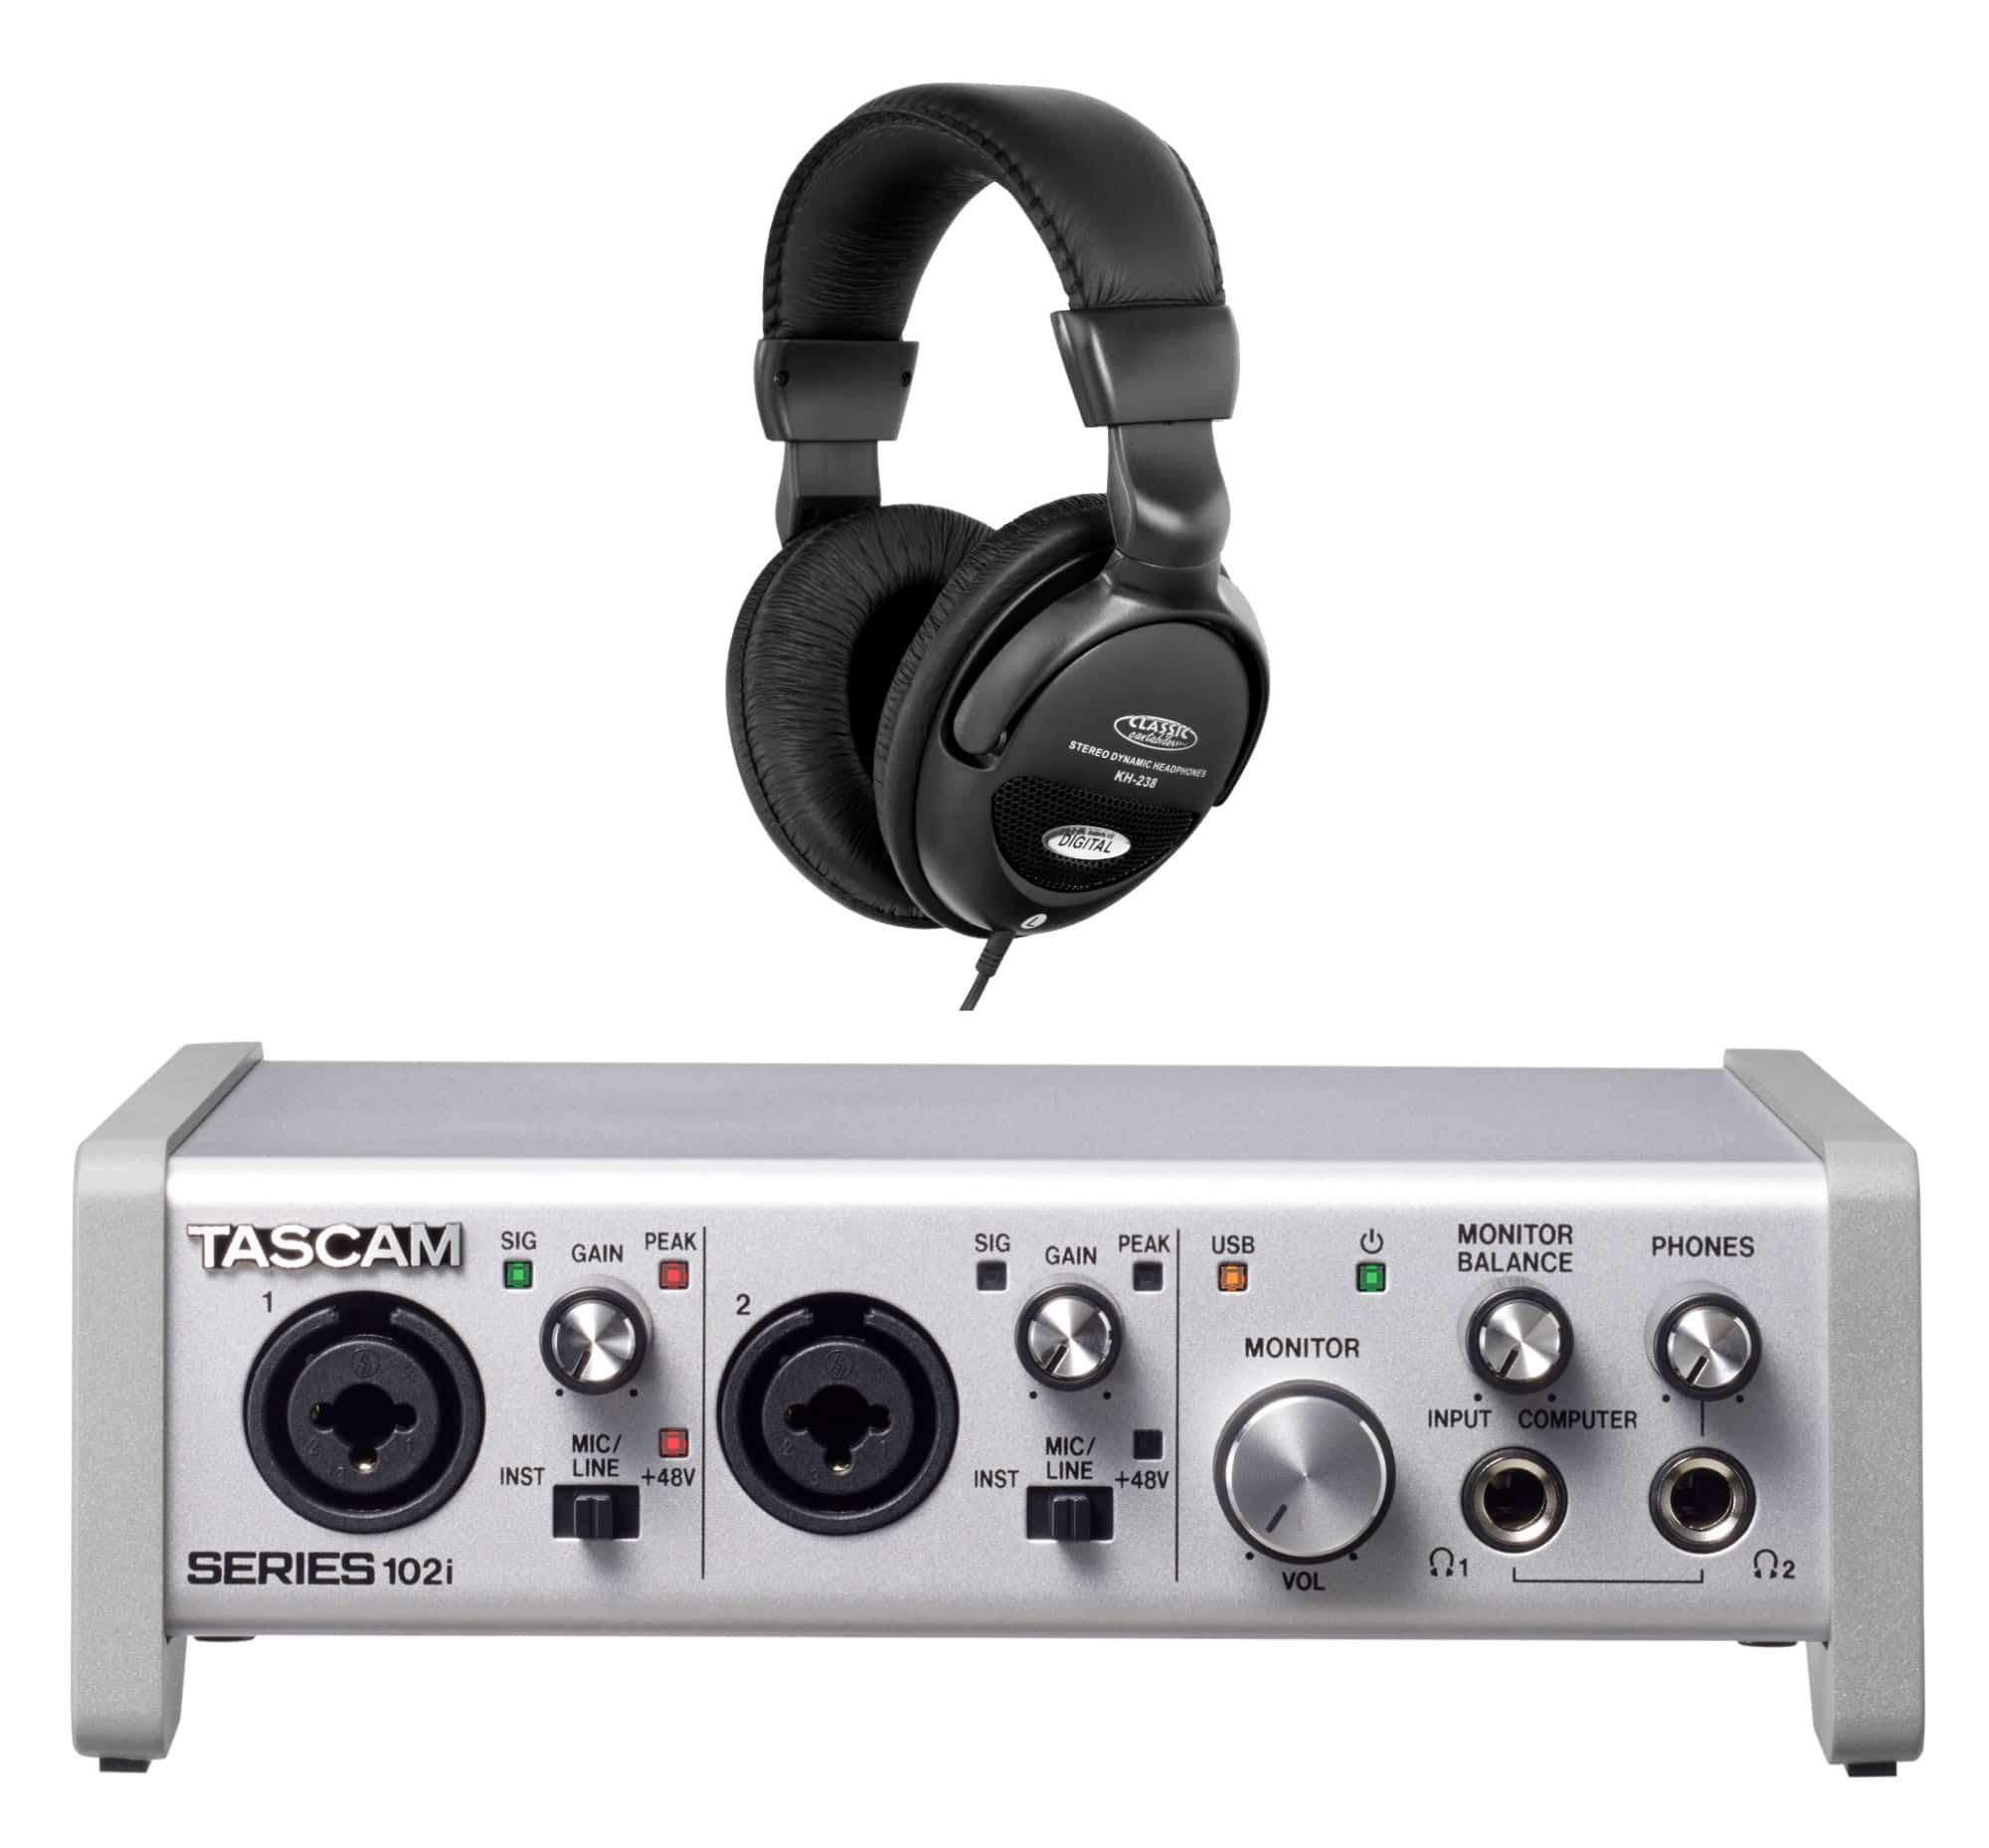 Pchardware - Tascam Series 102i USB Audio Interface Set - Onlineshop Musikhaus Kirstein